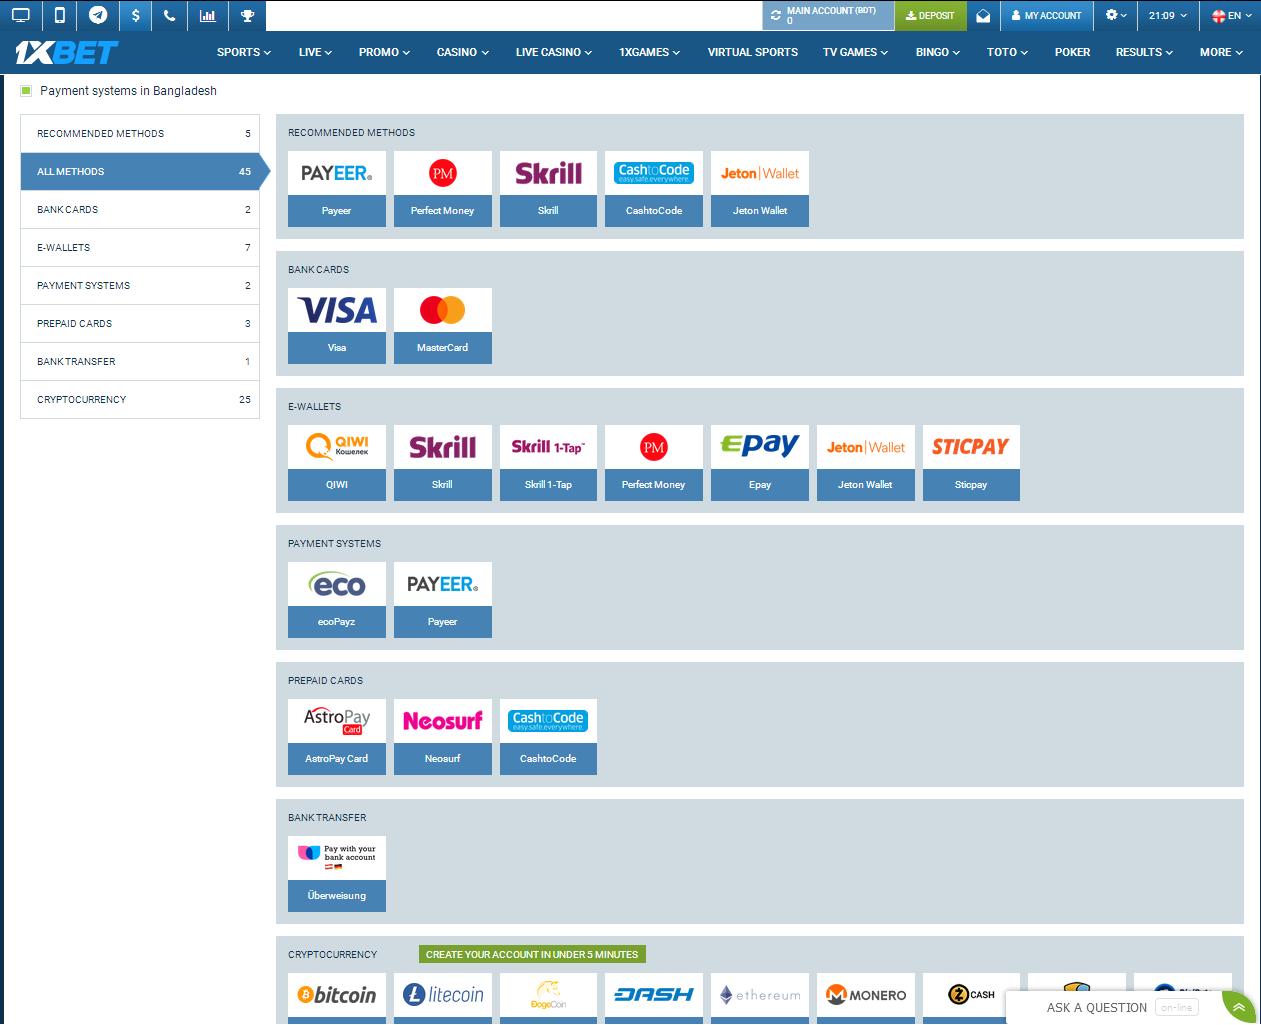 Payment Methods for Bangladesh